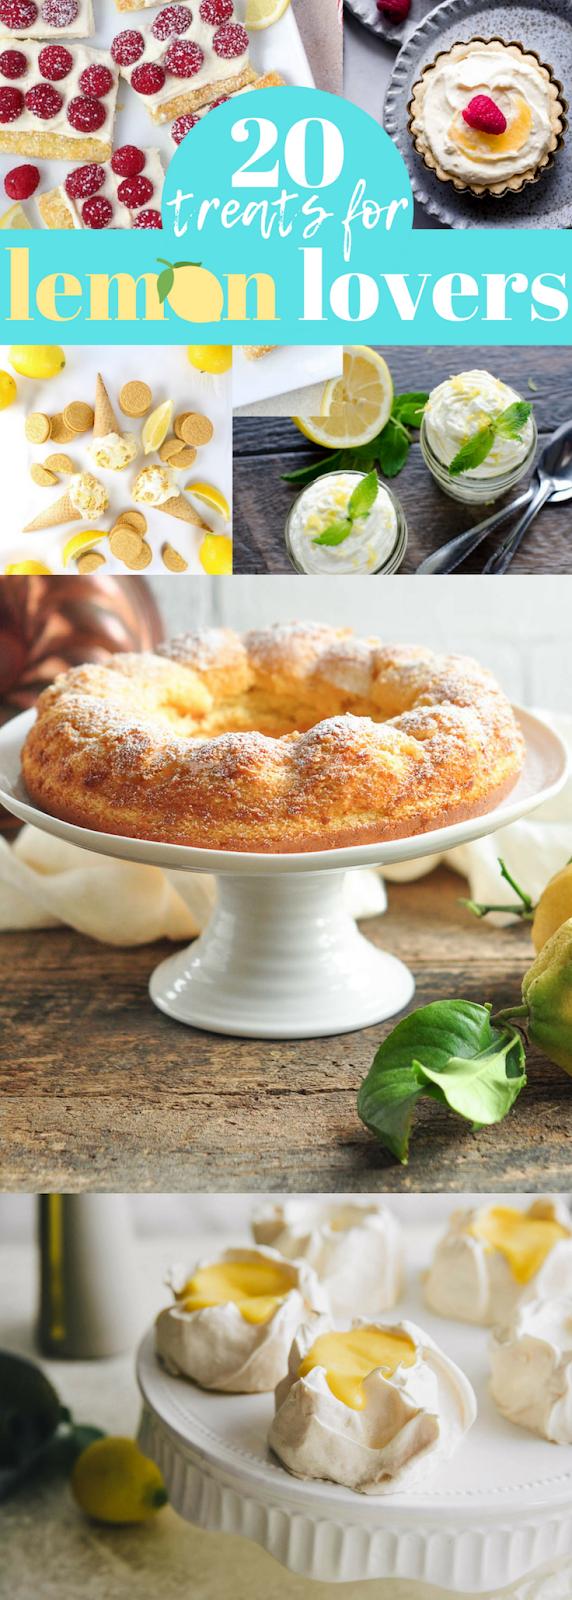 Homemade Lemon Recipes (Cakes, Cookies, Desserts Galore!)